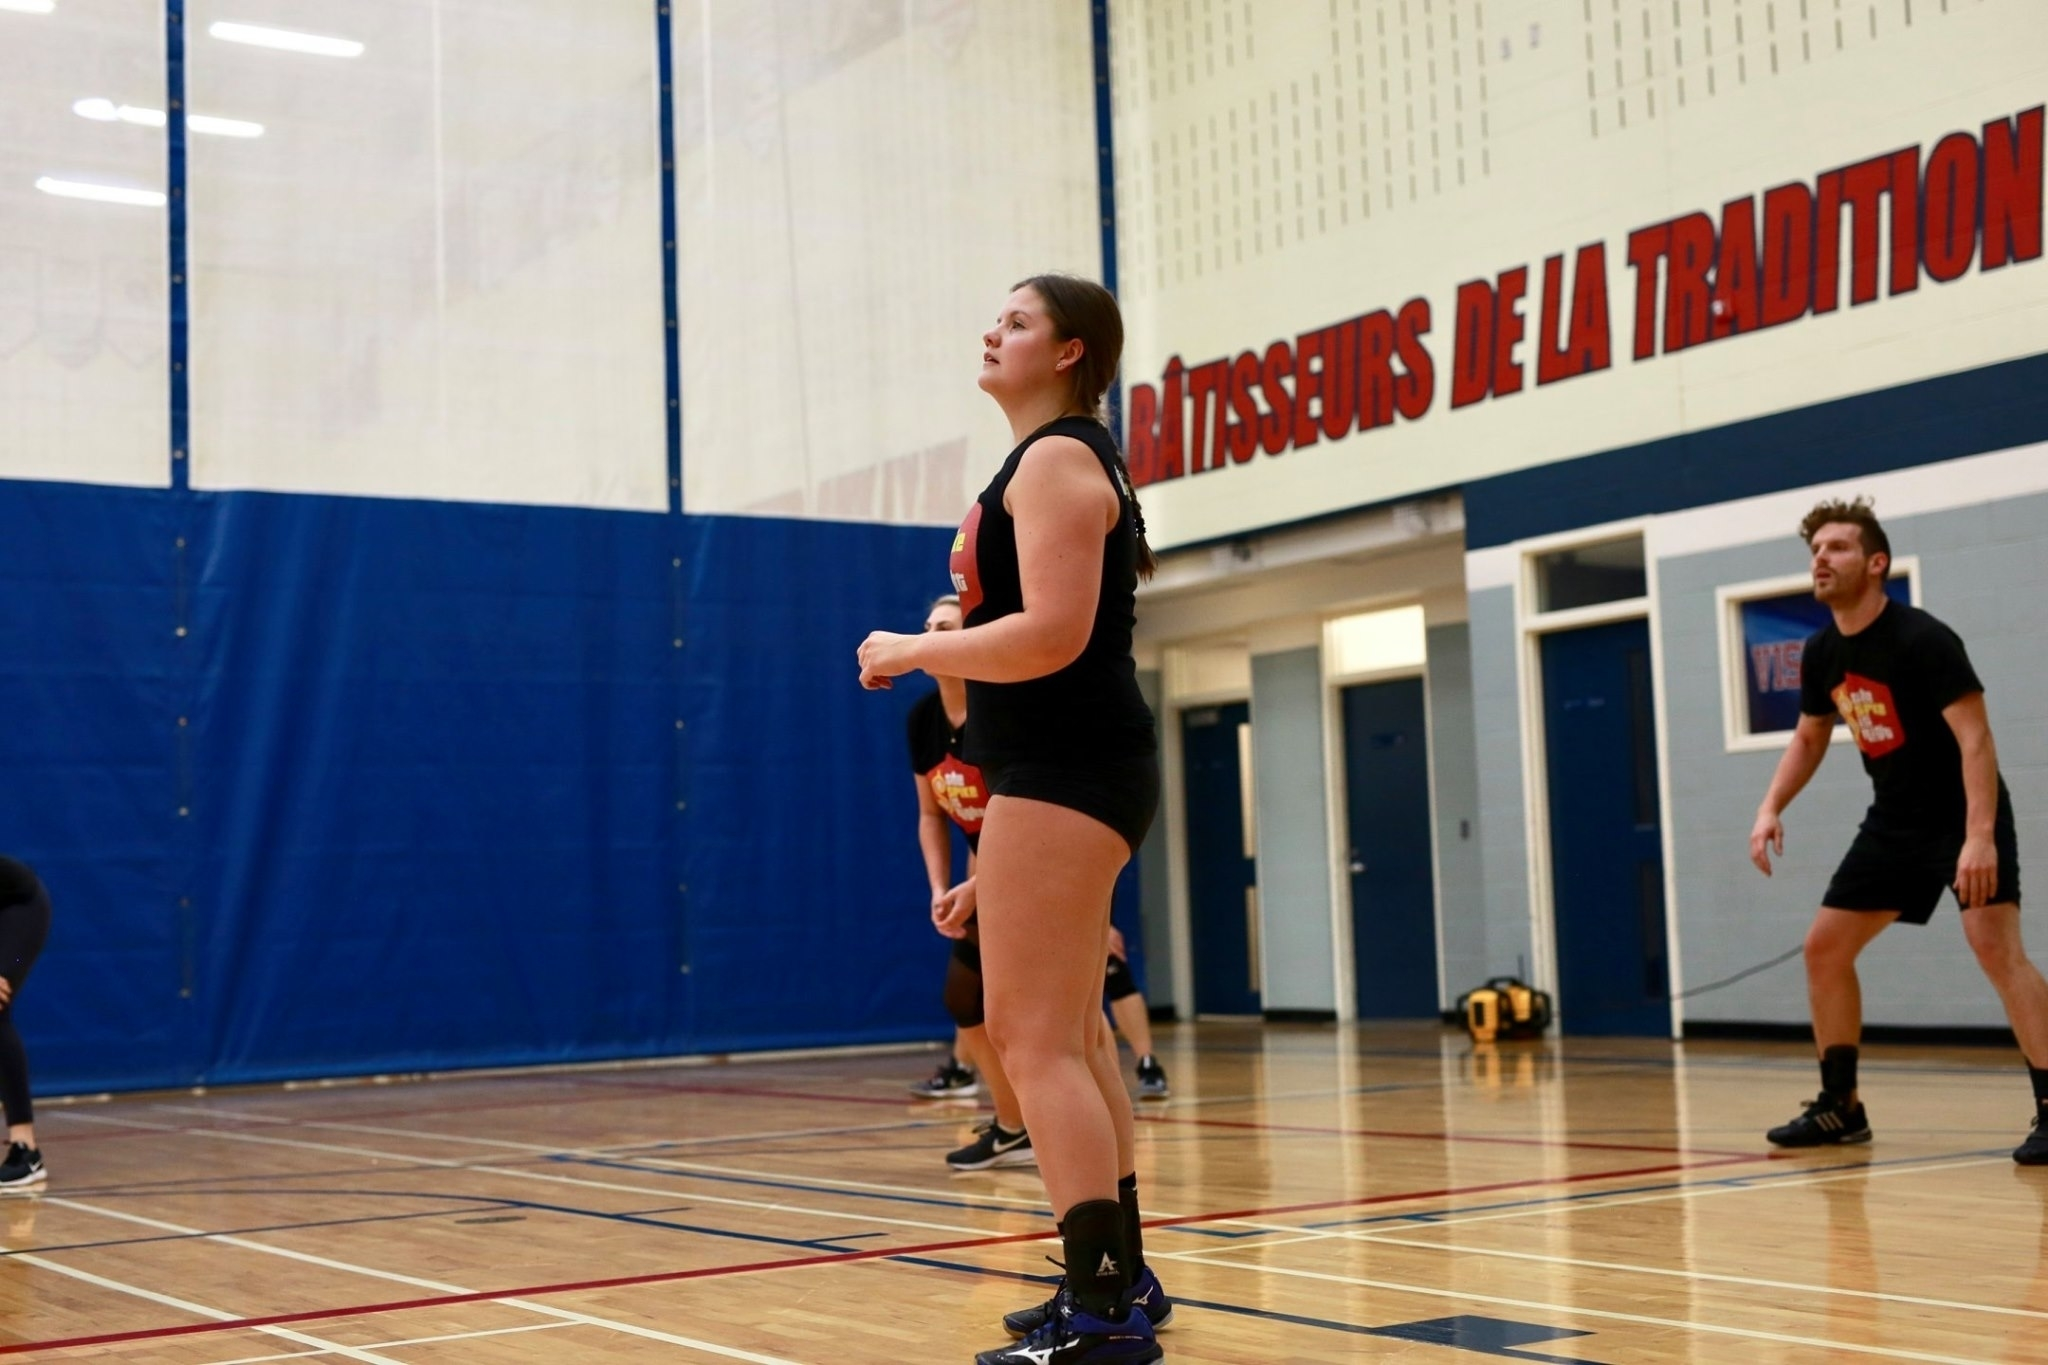 Niagara Sport & Social Club